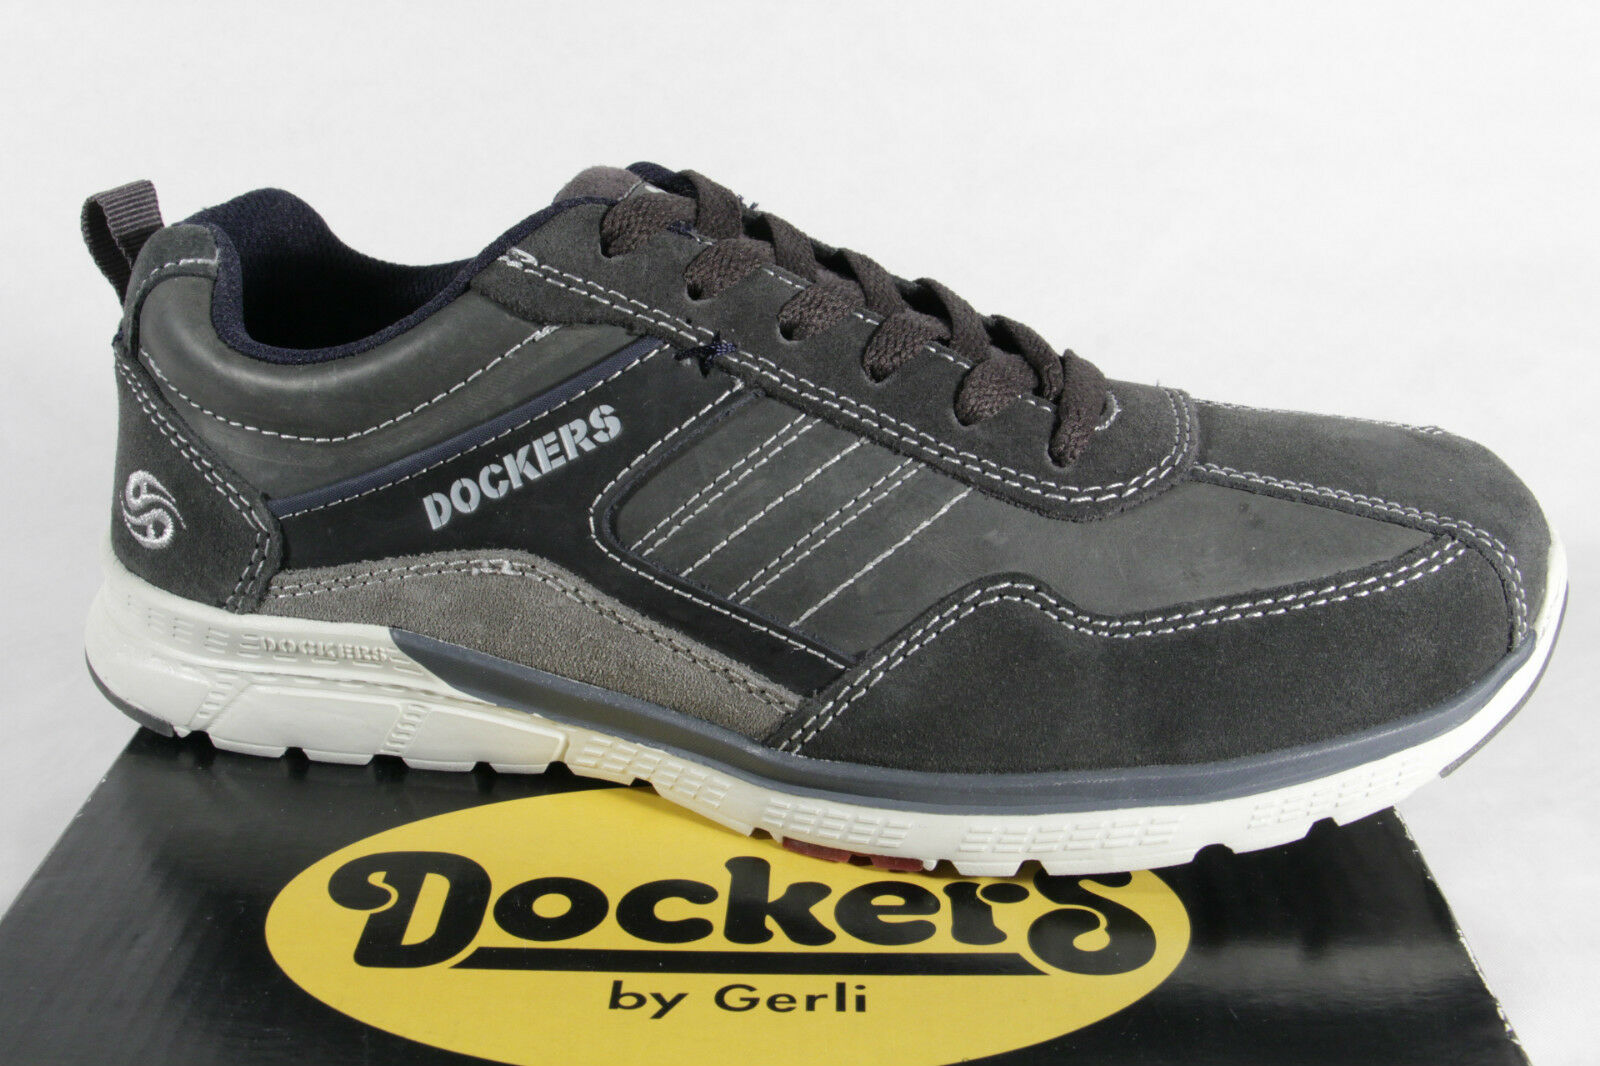 Dockers Herren Schnürschuhe Halbschuhe Sneakers grau Leder  38RE001  NEU!